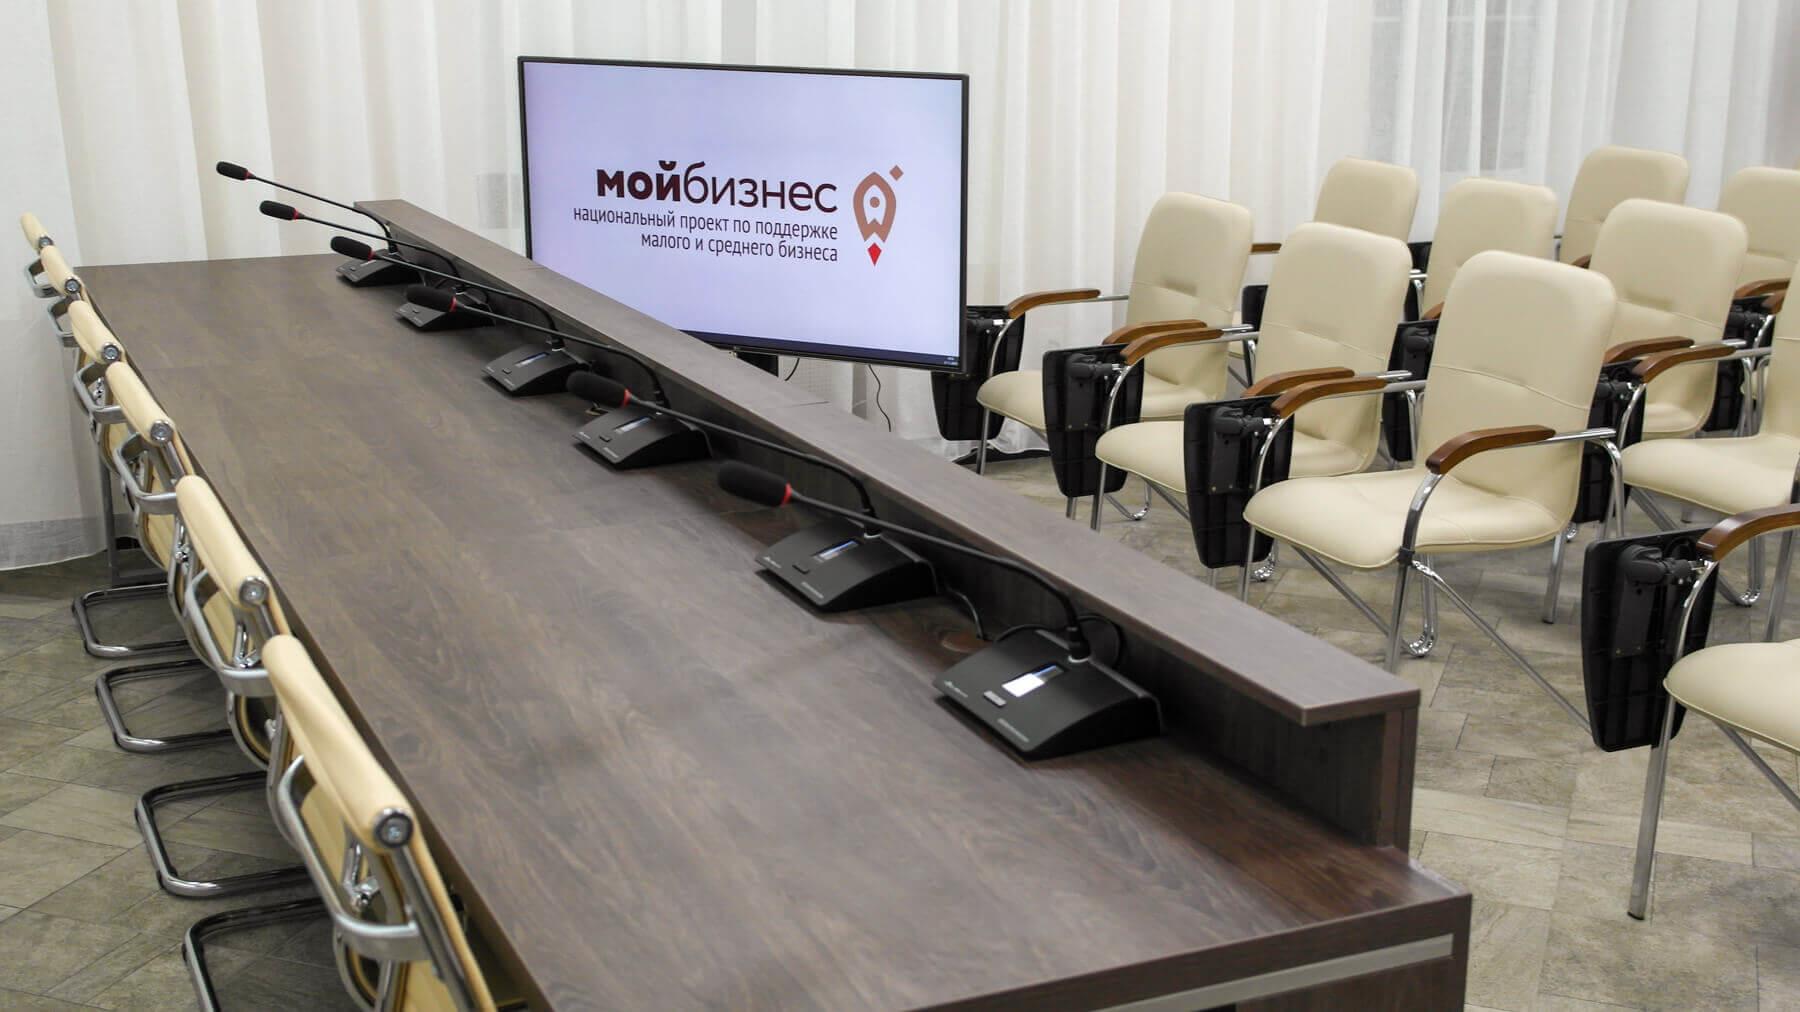 Конференц-залы для МФЦ «Мой бизнес» Киров